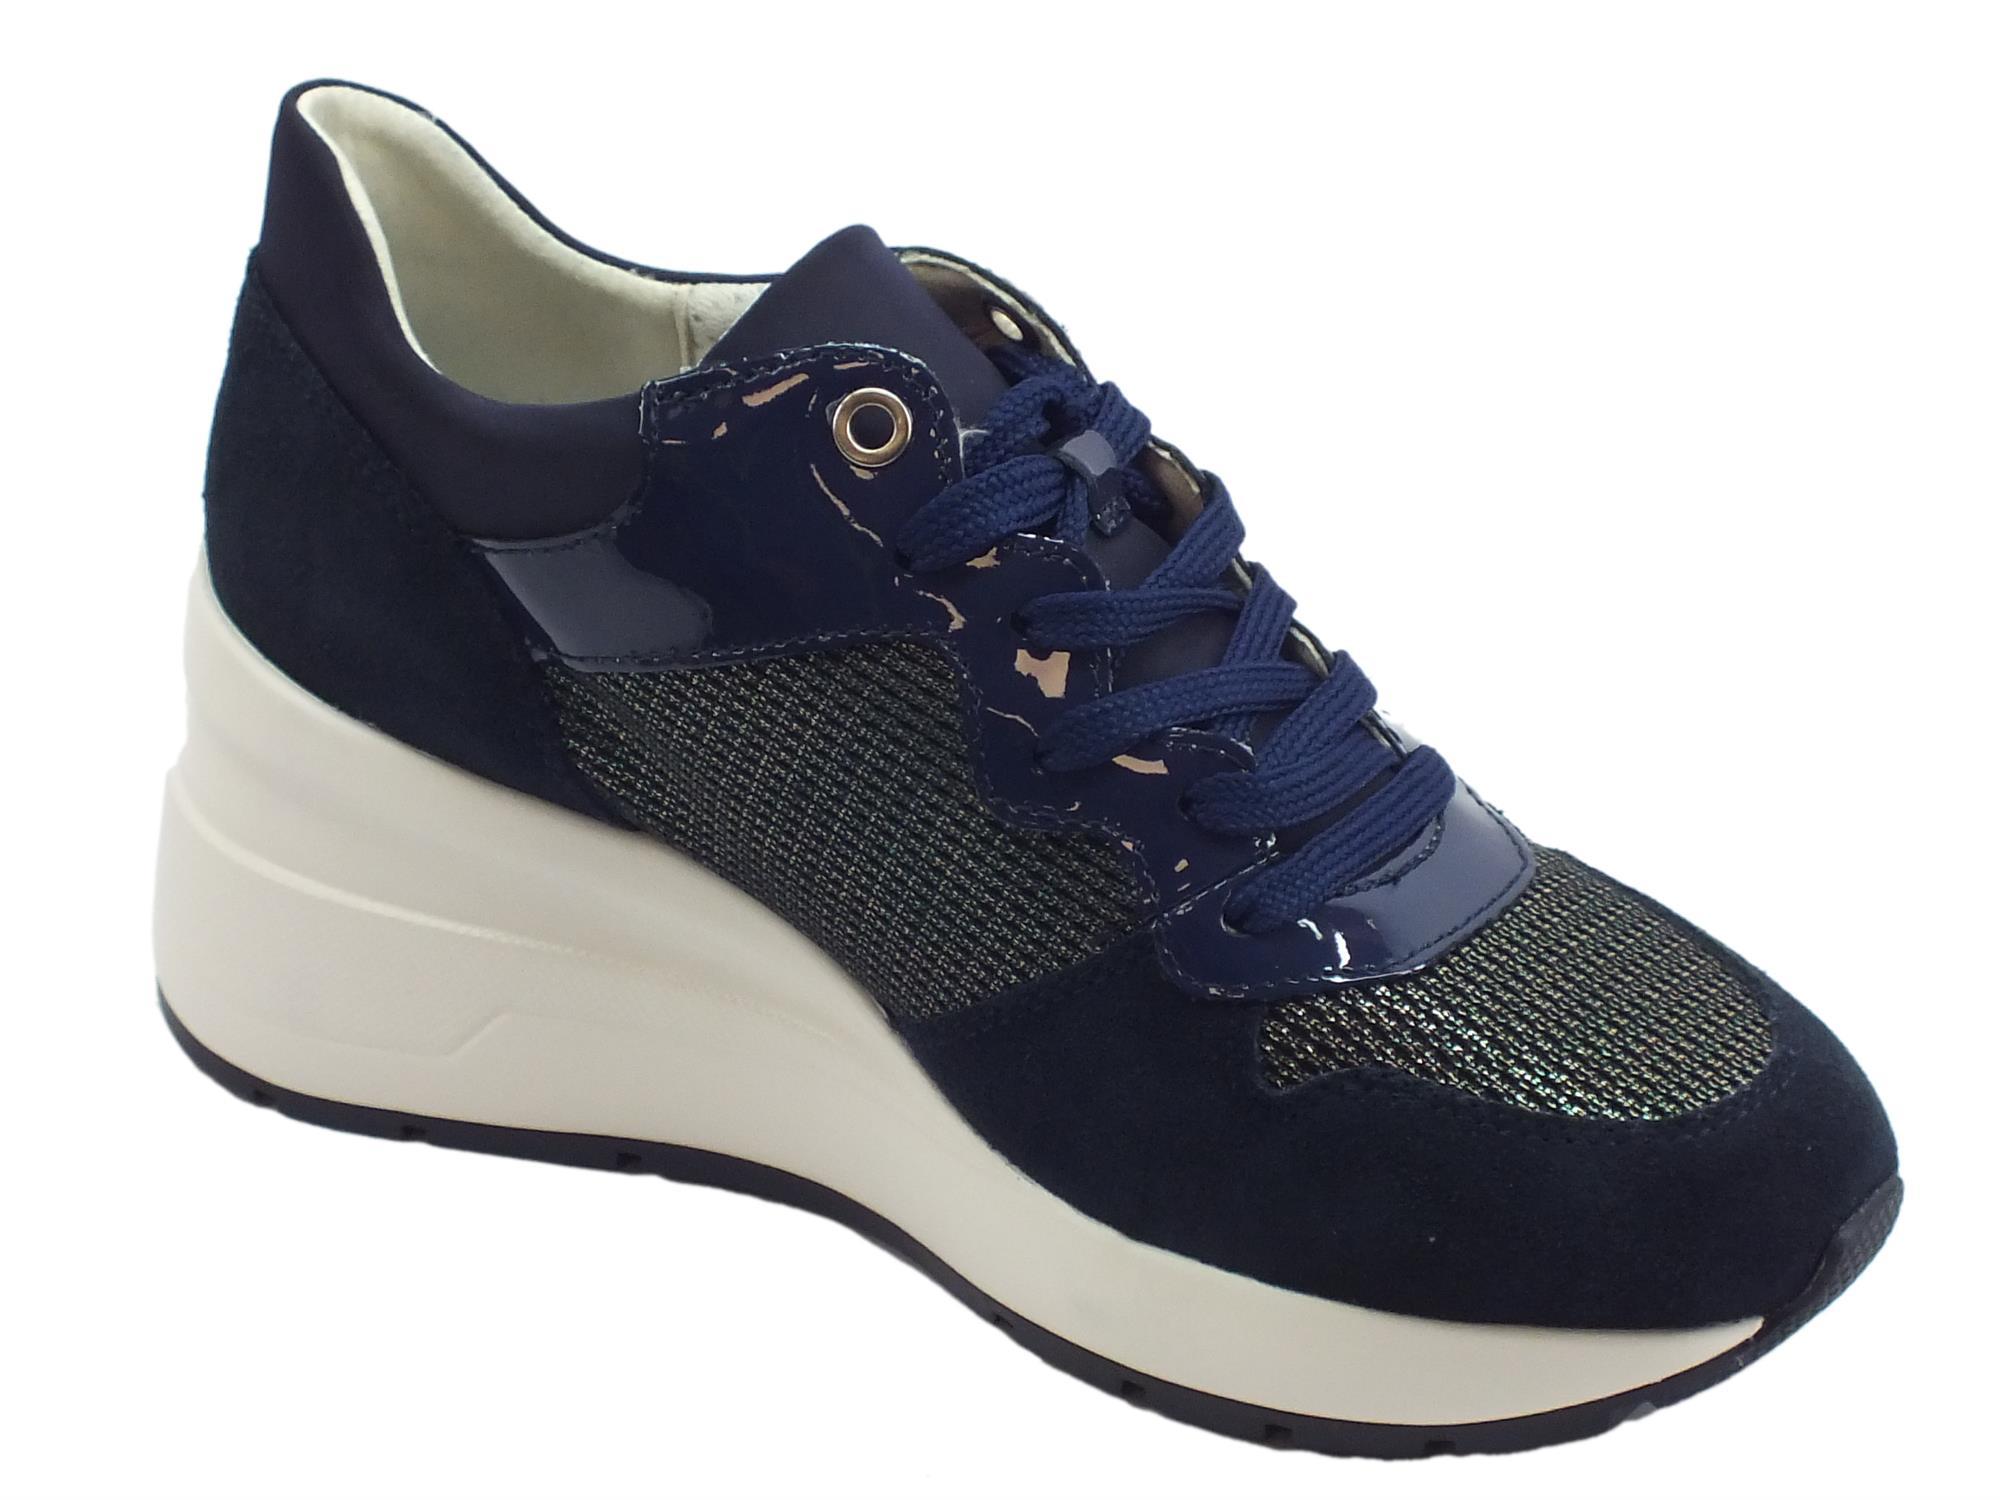 76dcea1088 Geox D Zosma sneakers donna in vernice camoscio e tessuto blu zeppa alta